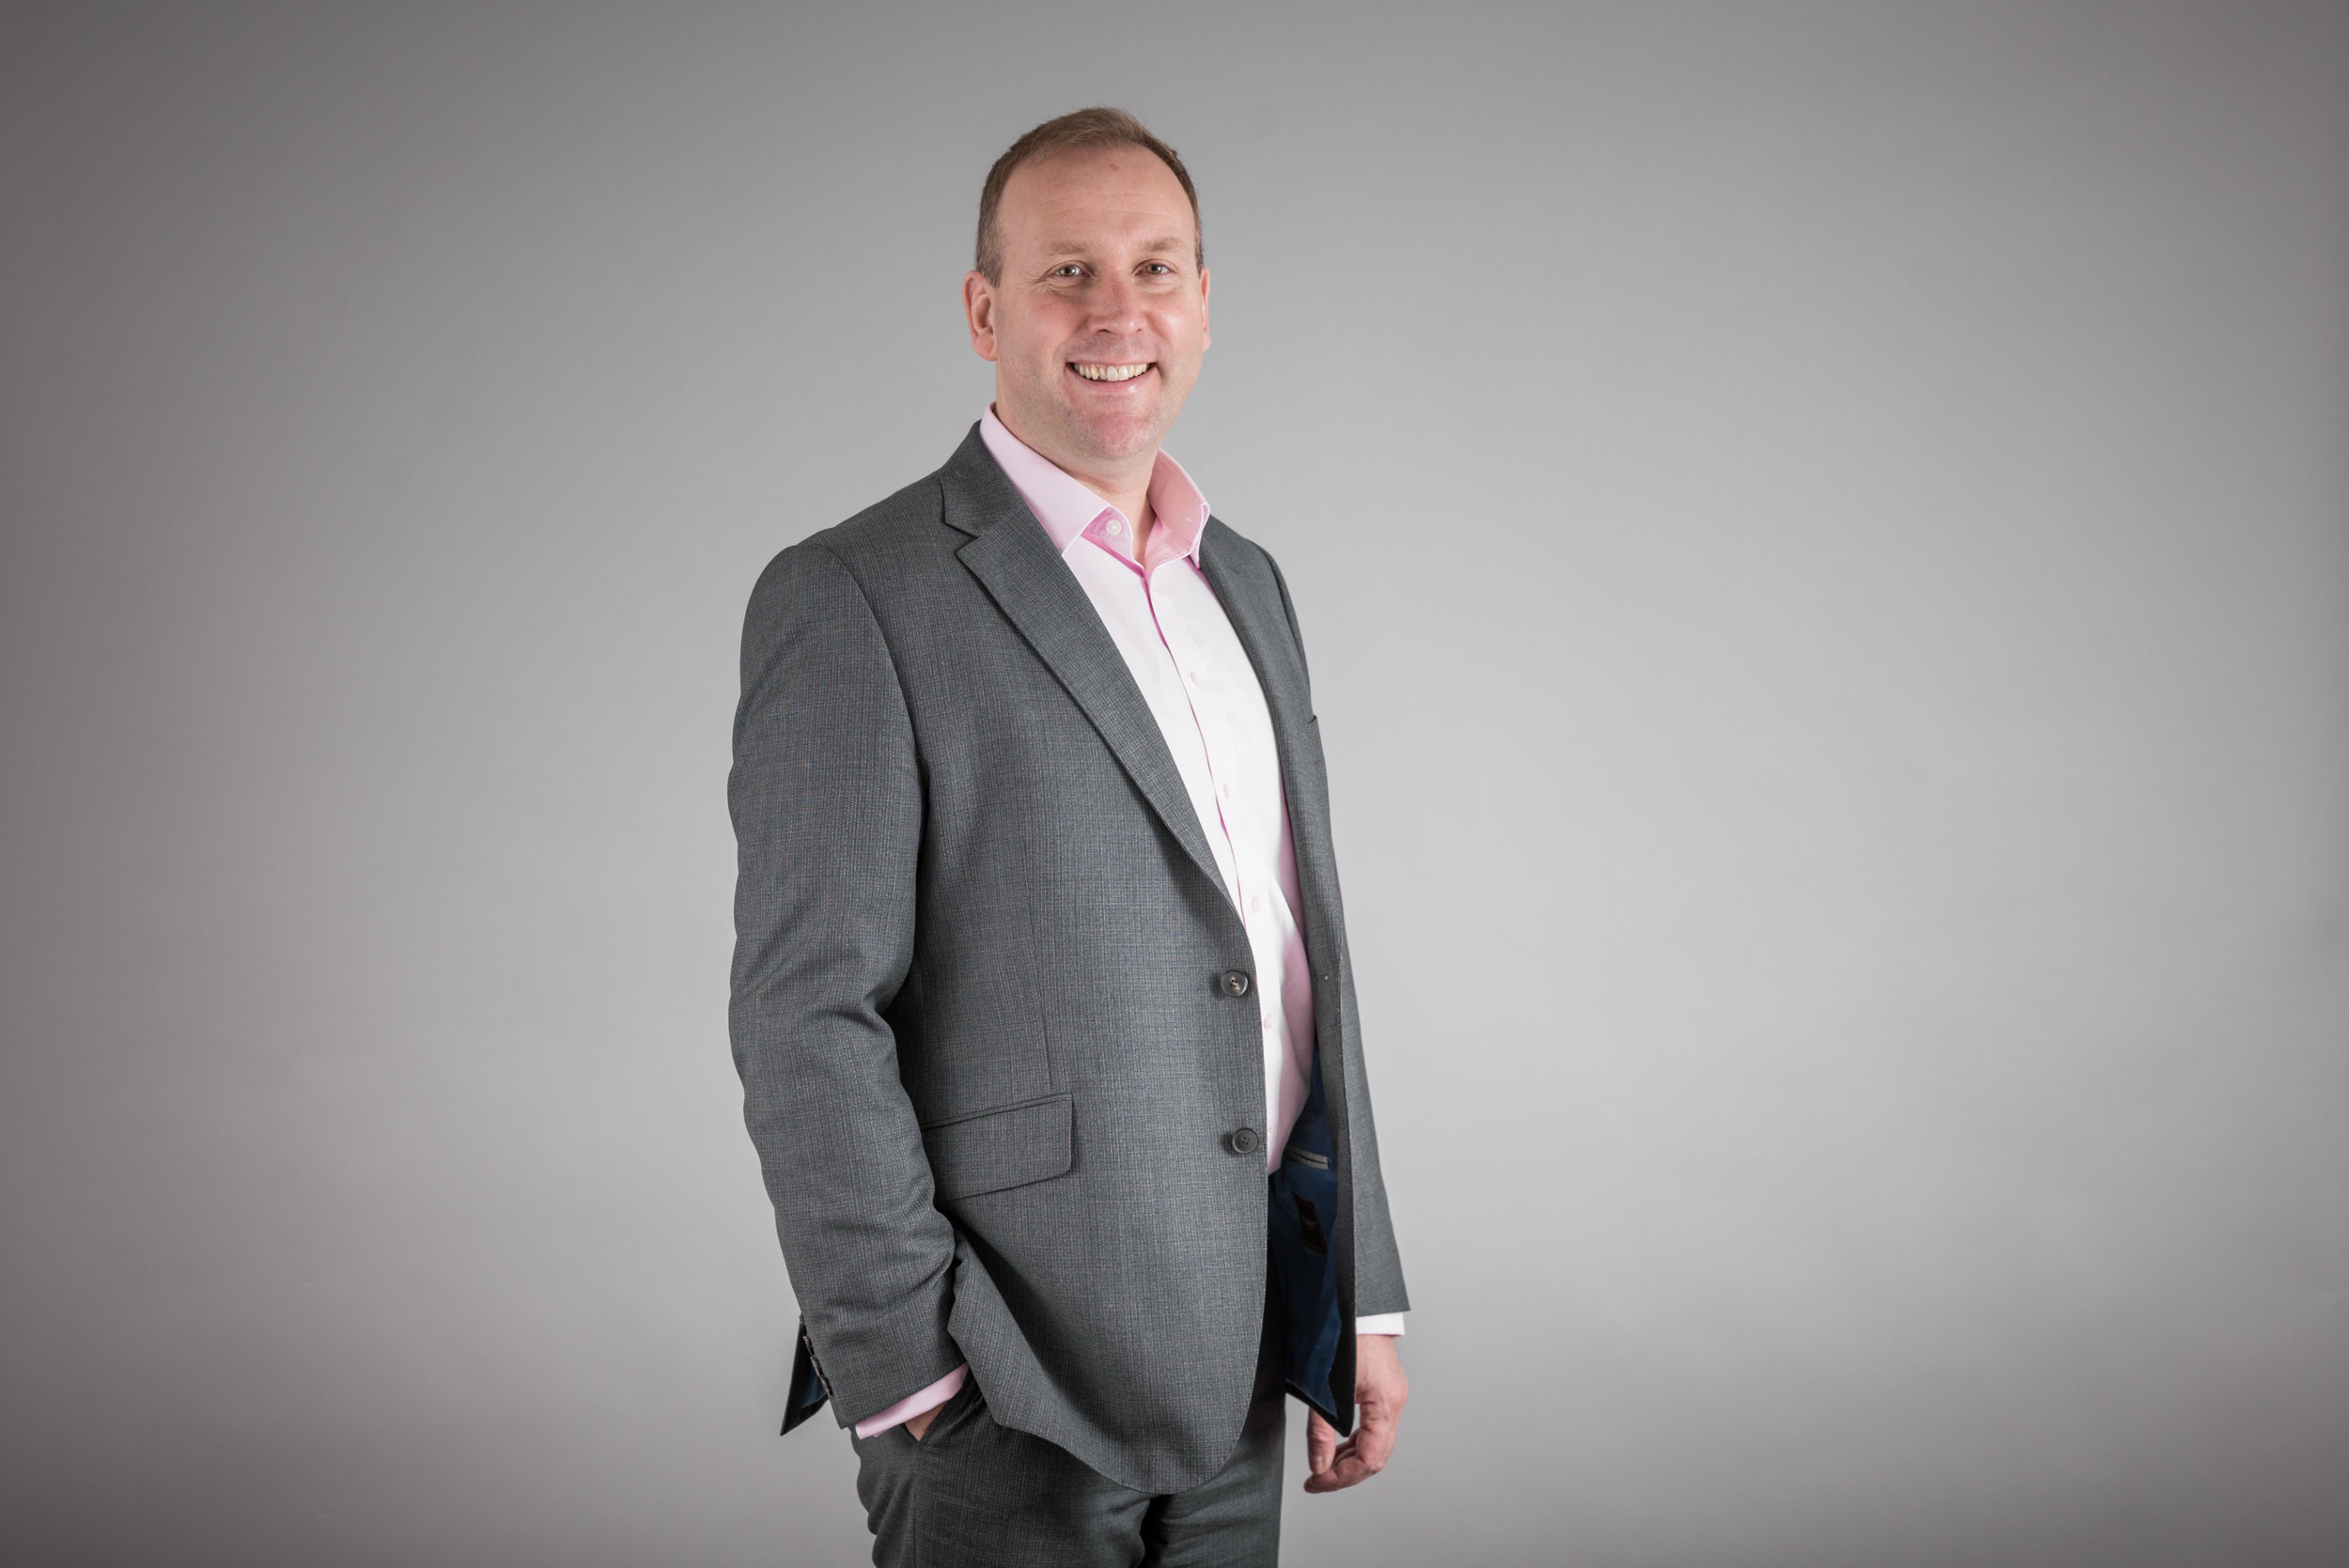 Businessman Portrait Photo Wearing grey Jacket and pink shirt